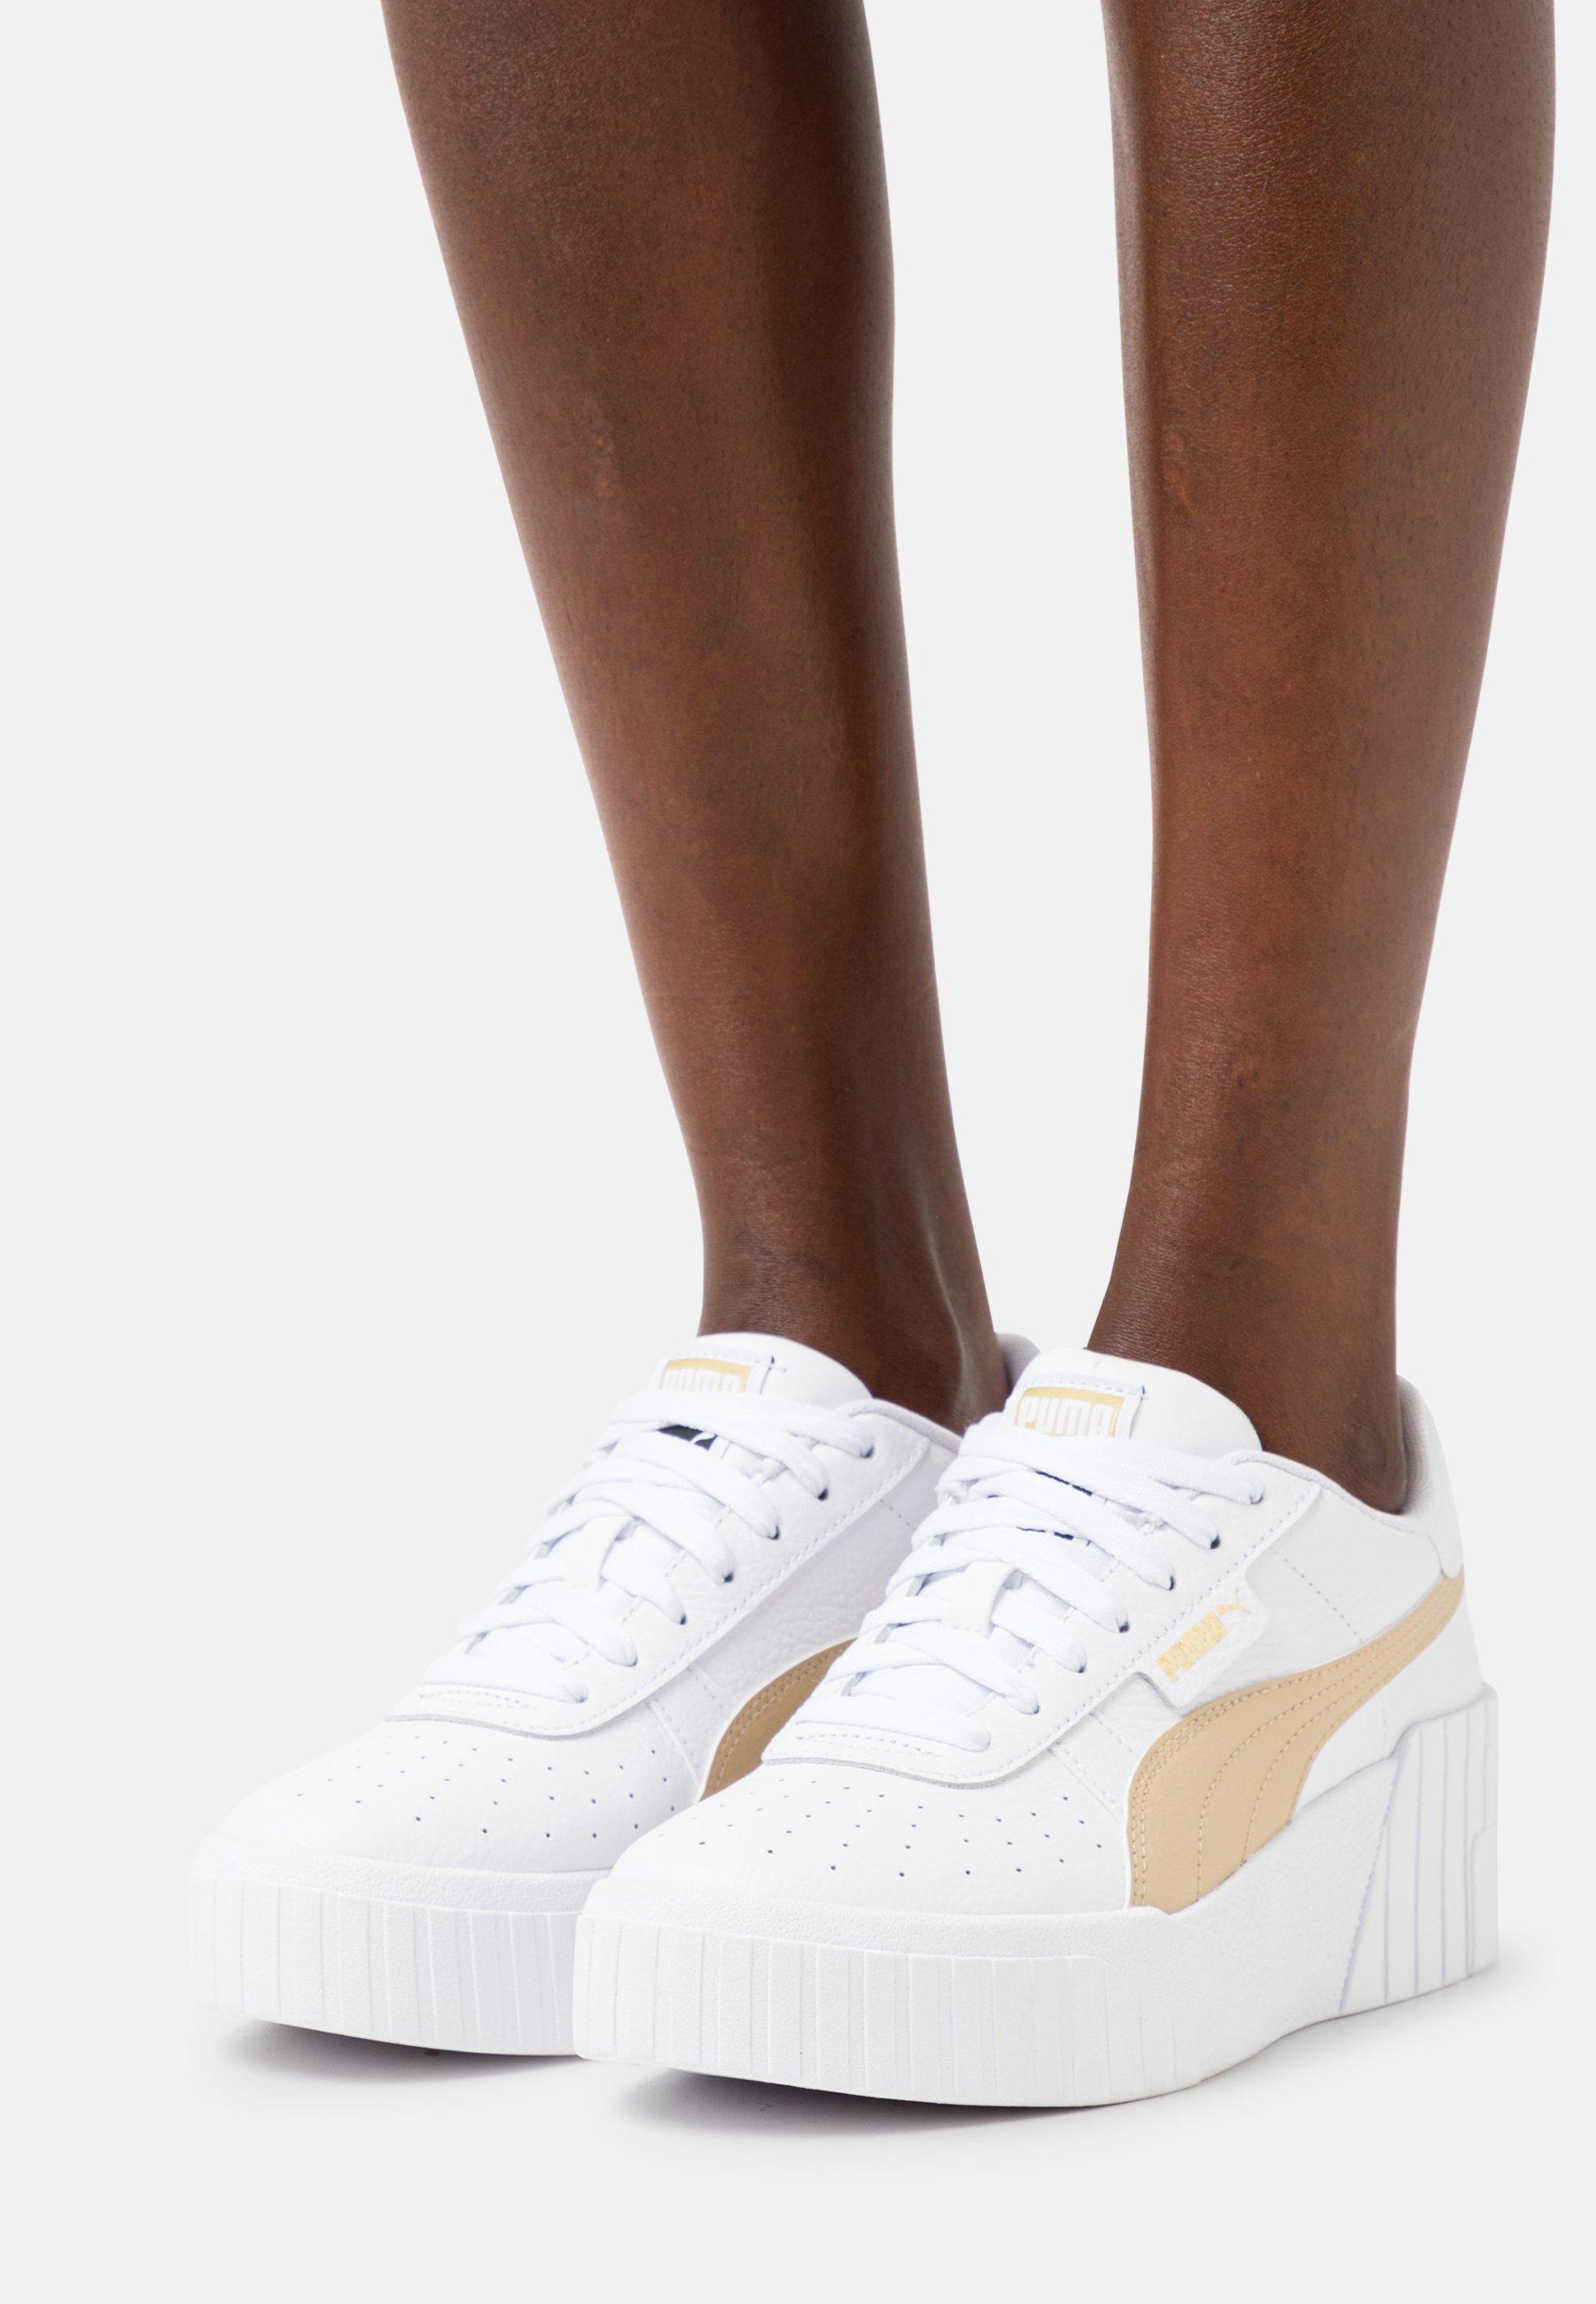 Puma CALI WEDGE - Baskets basses - white/black/blanc - ZALANDO.FR